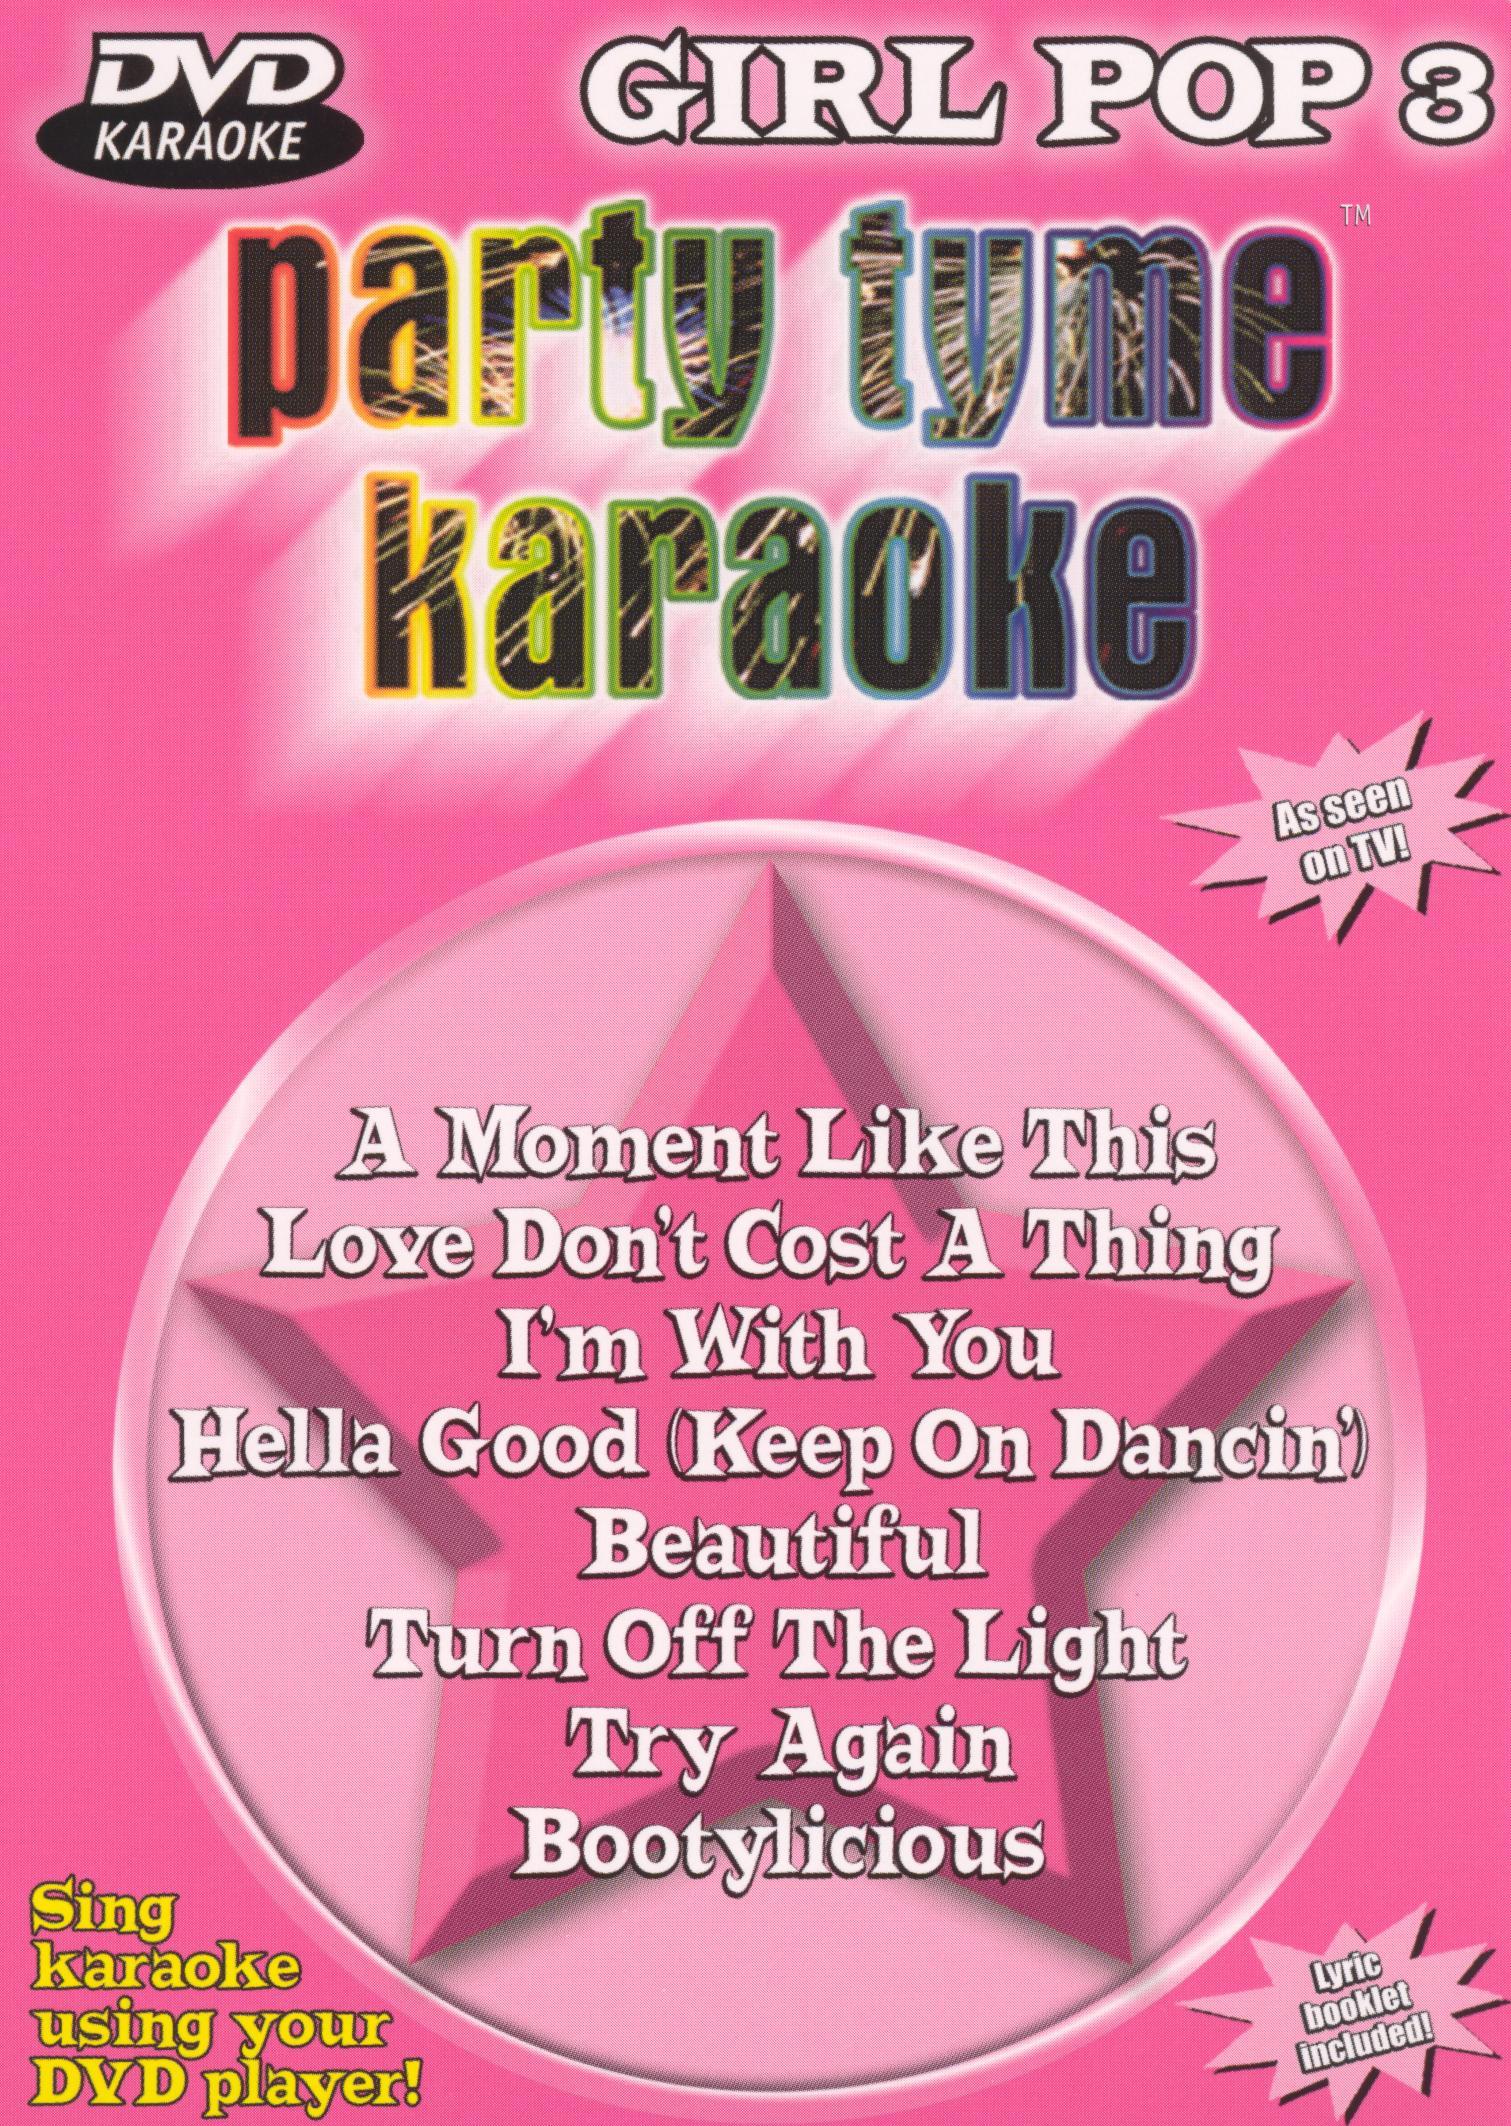 Party Tyme Karaoke: Girl Pop, Vol. 3